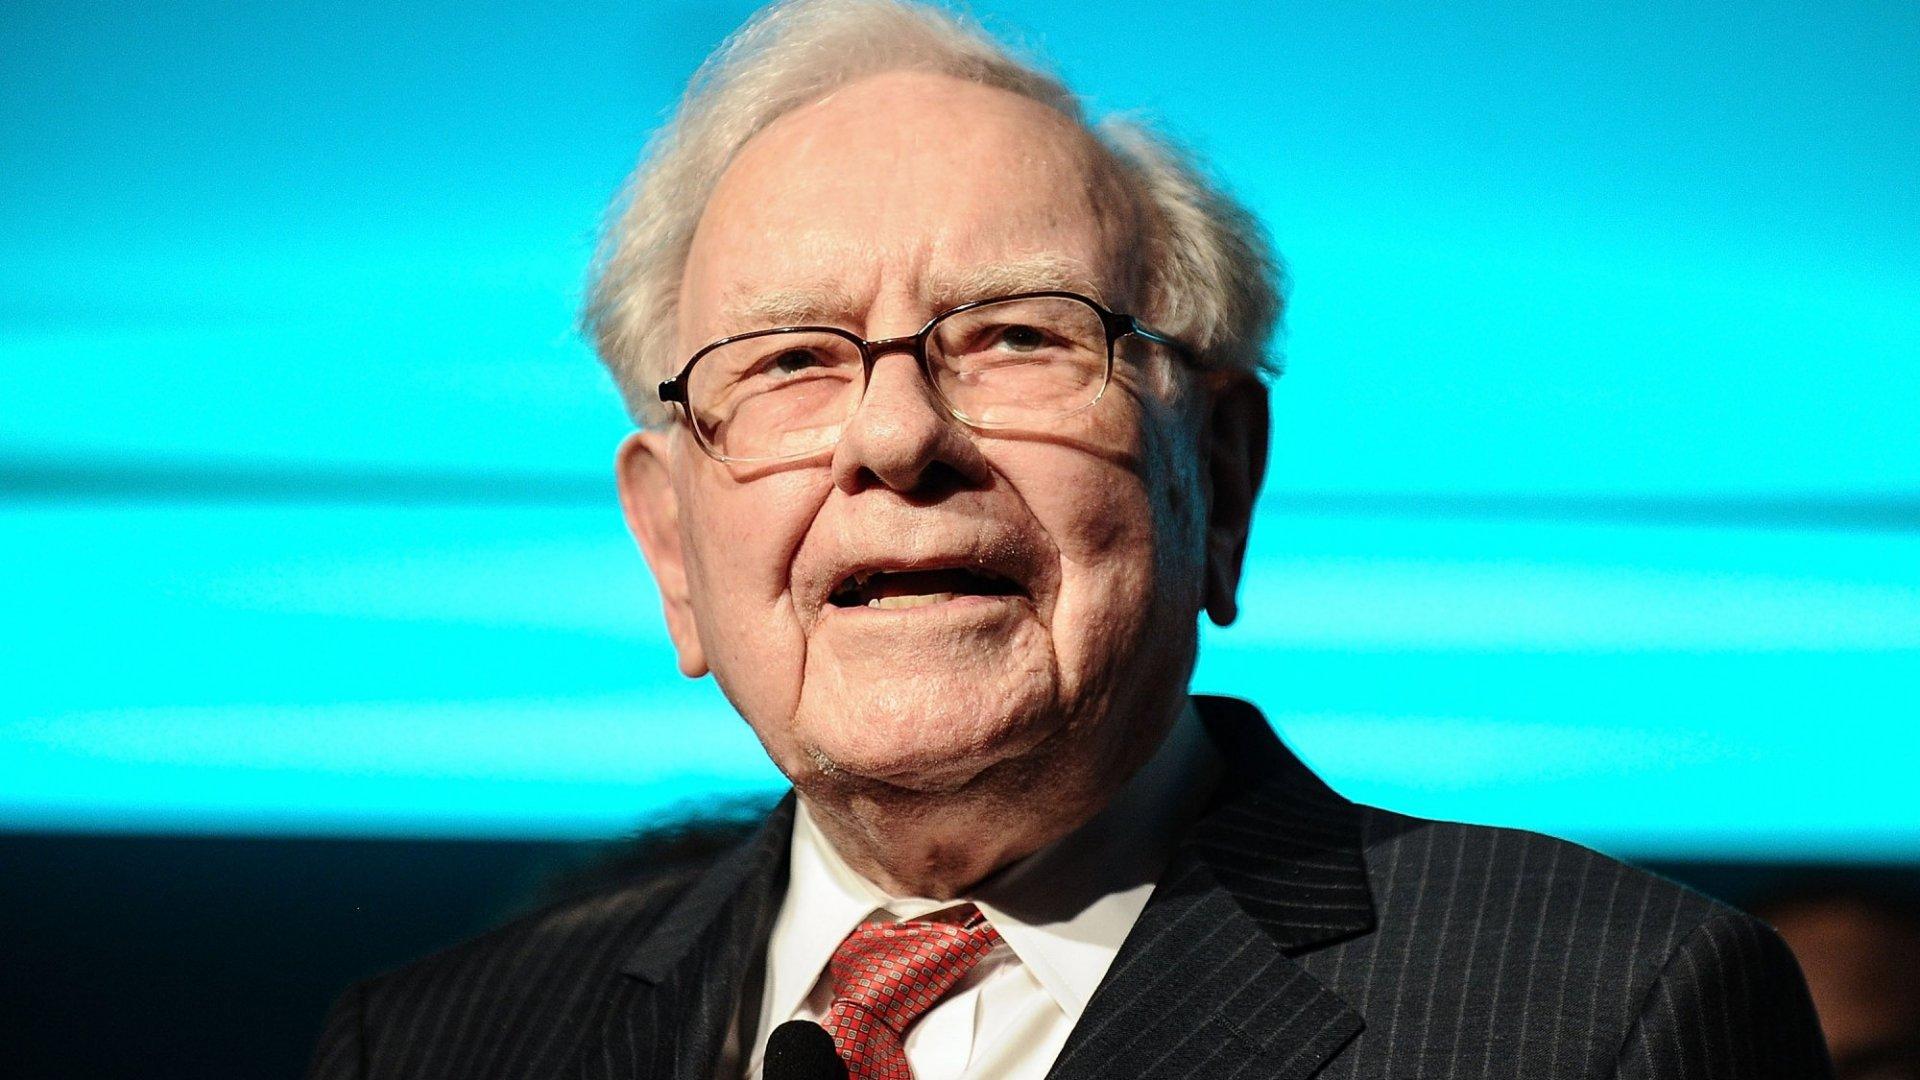 Warren Buffett's No. 1 Standard for Business Success Provides a Critical Clue for Your Own Prosperity